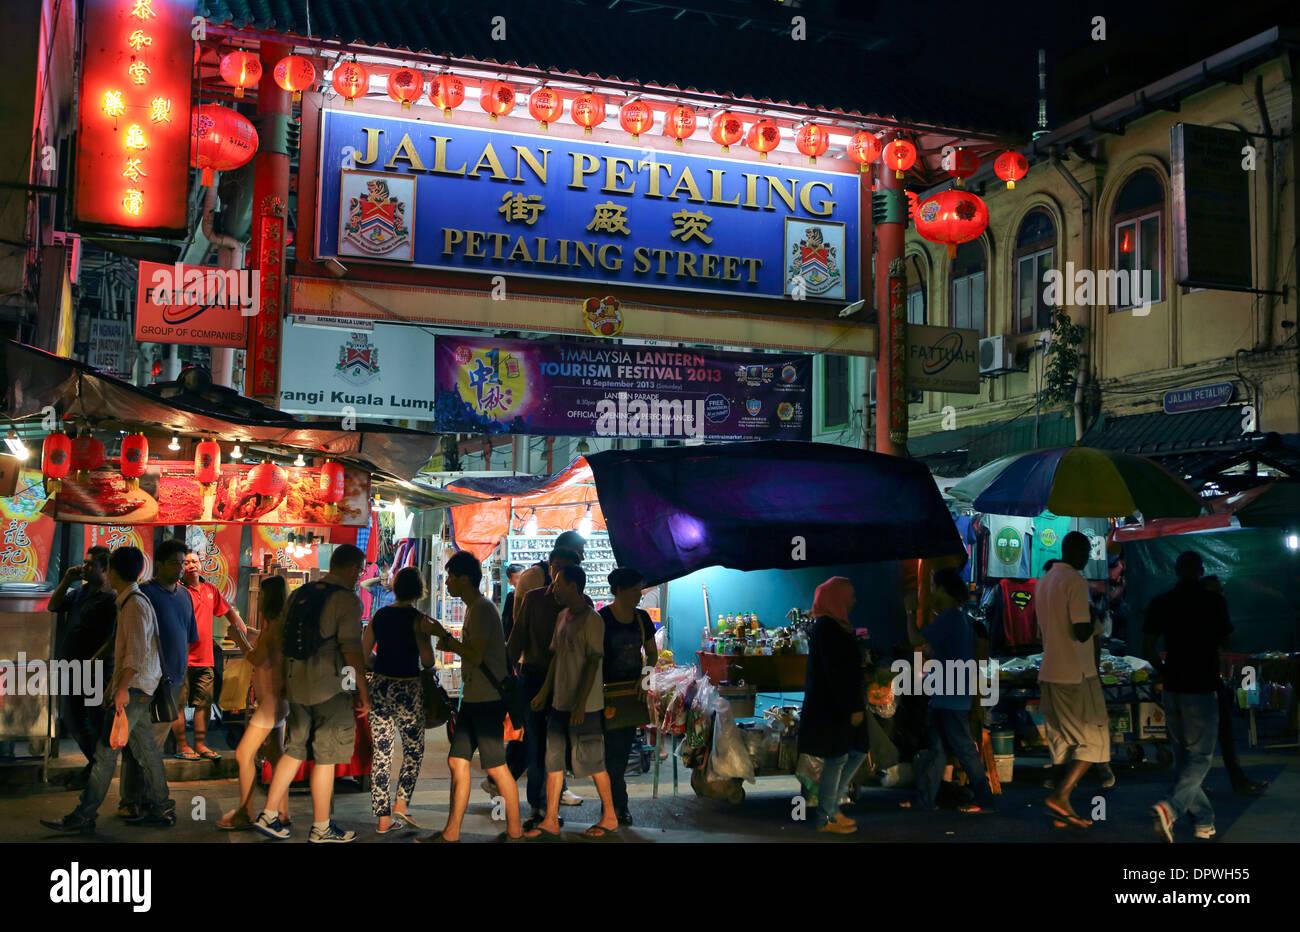 Petaling Street Night Market In Chinatown Kuala Lumpur Stock